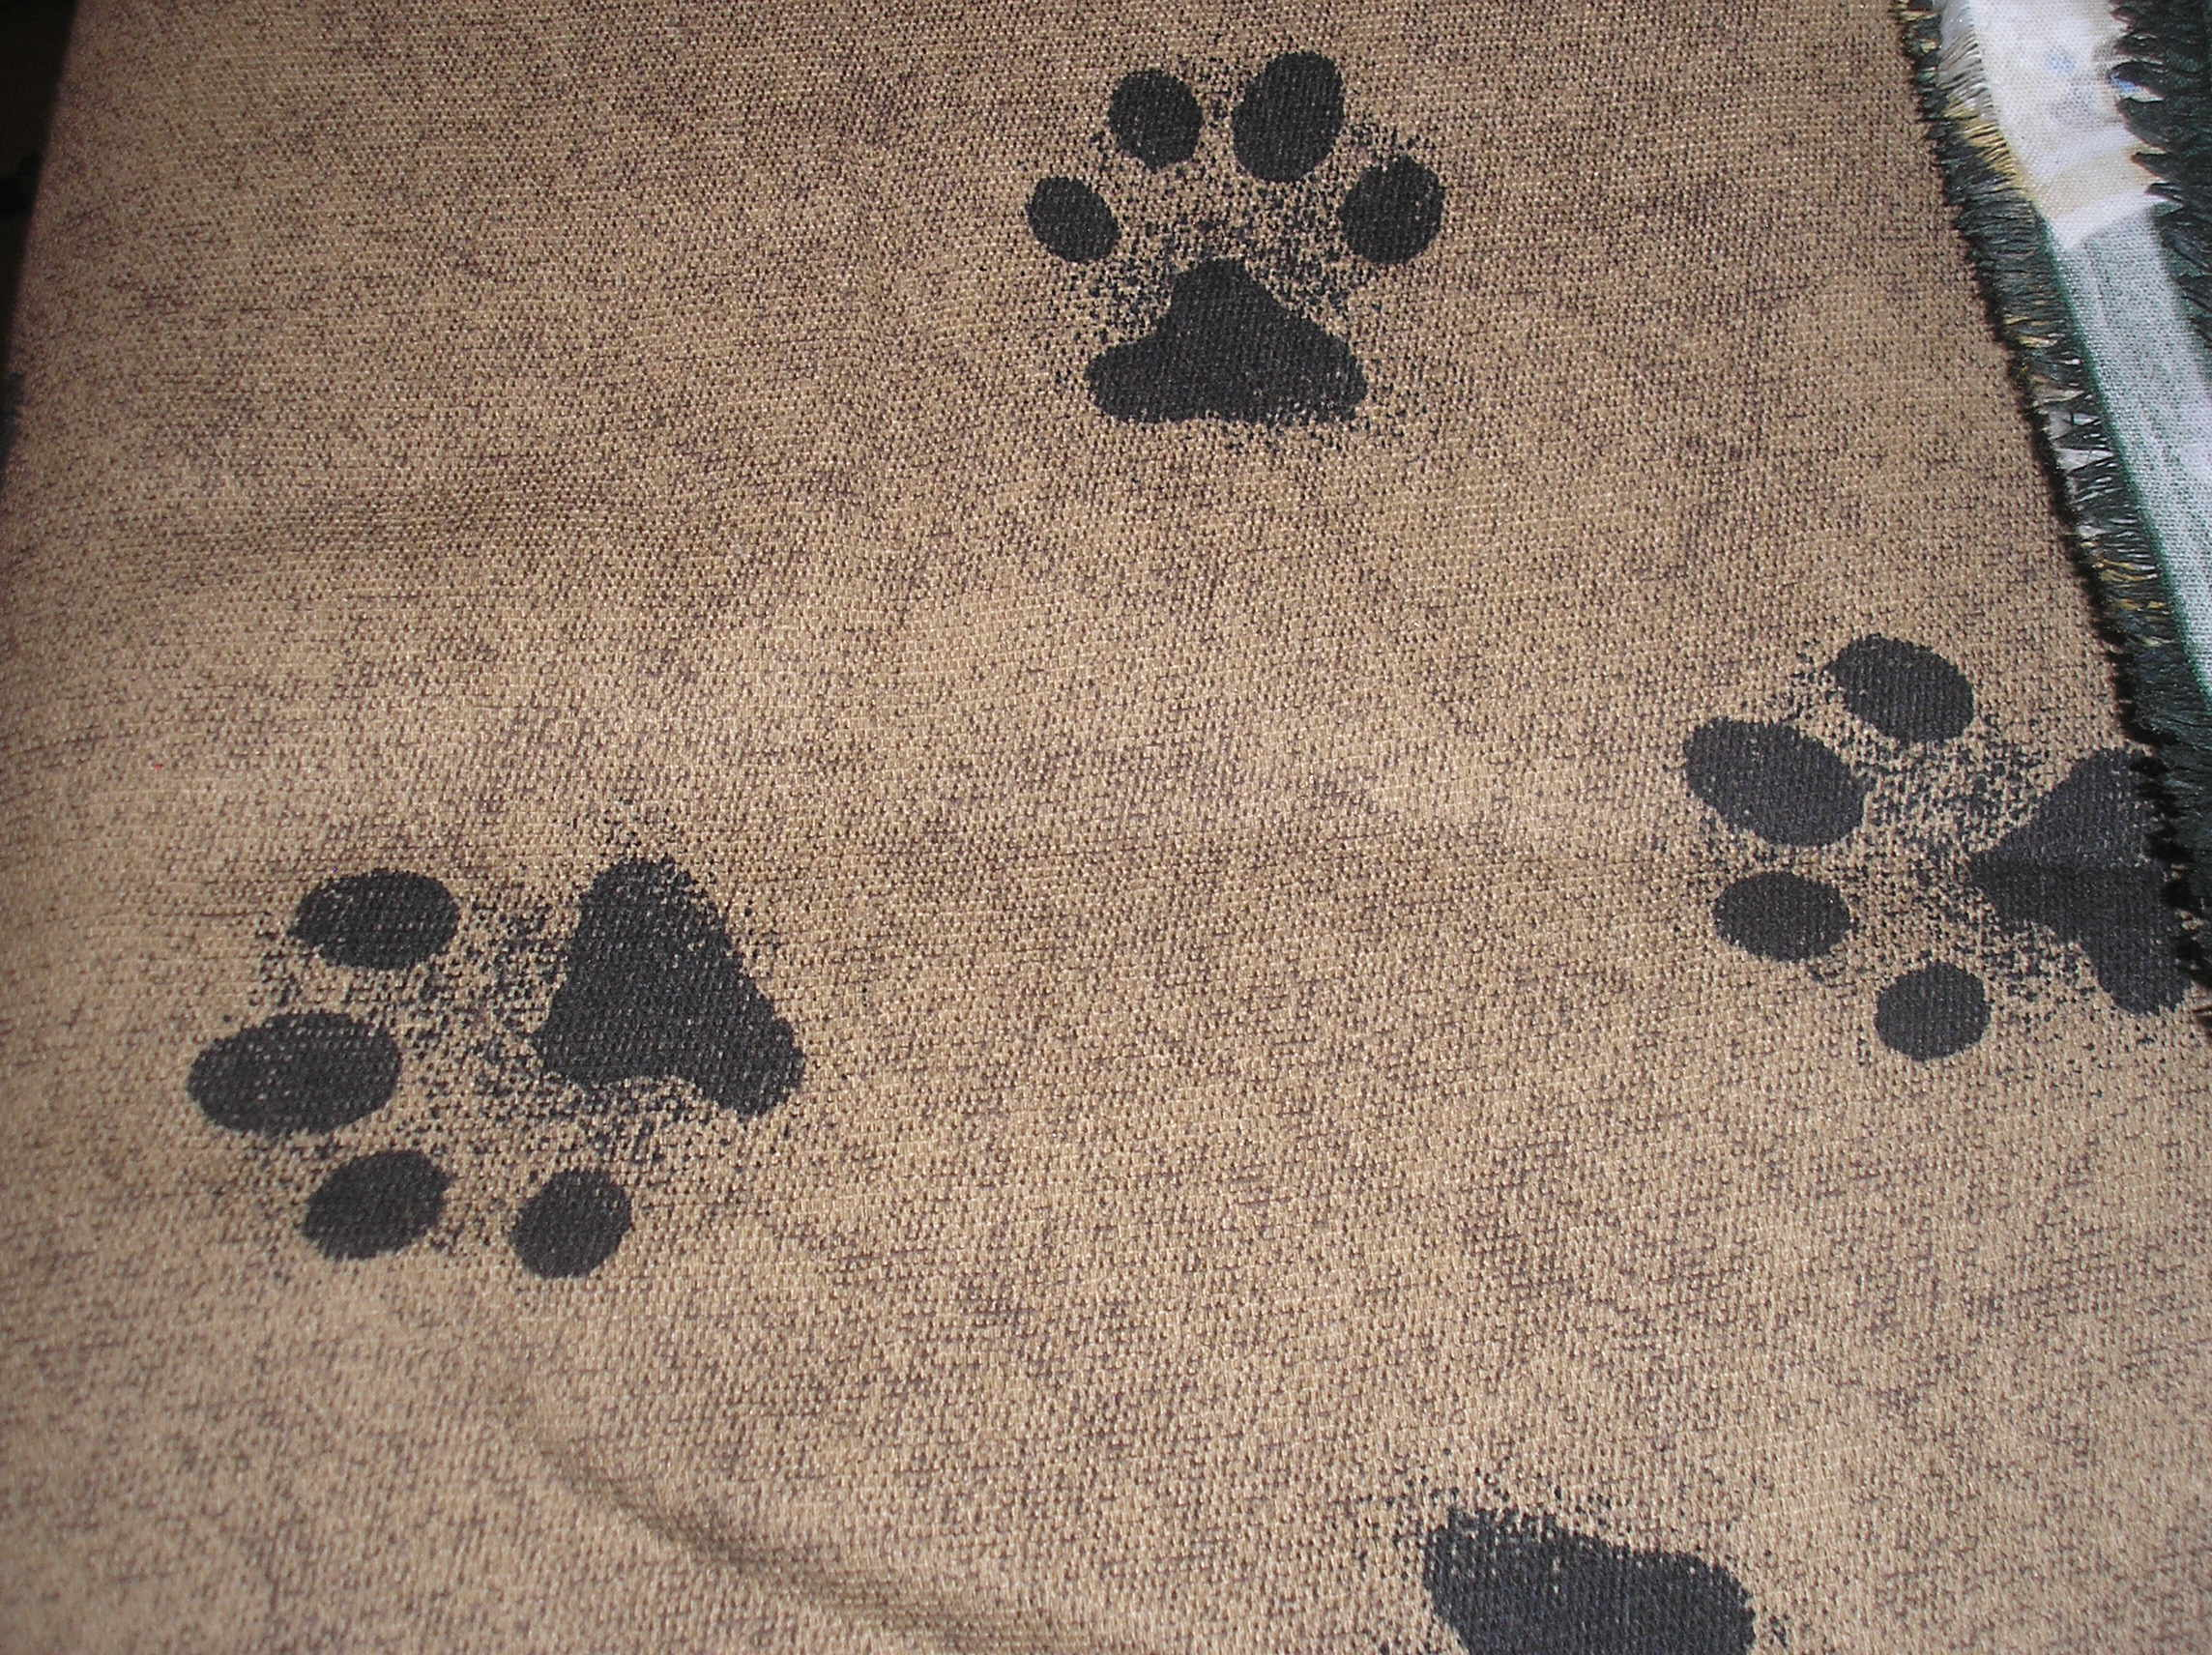 large paw prints